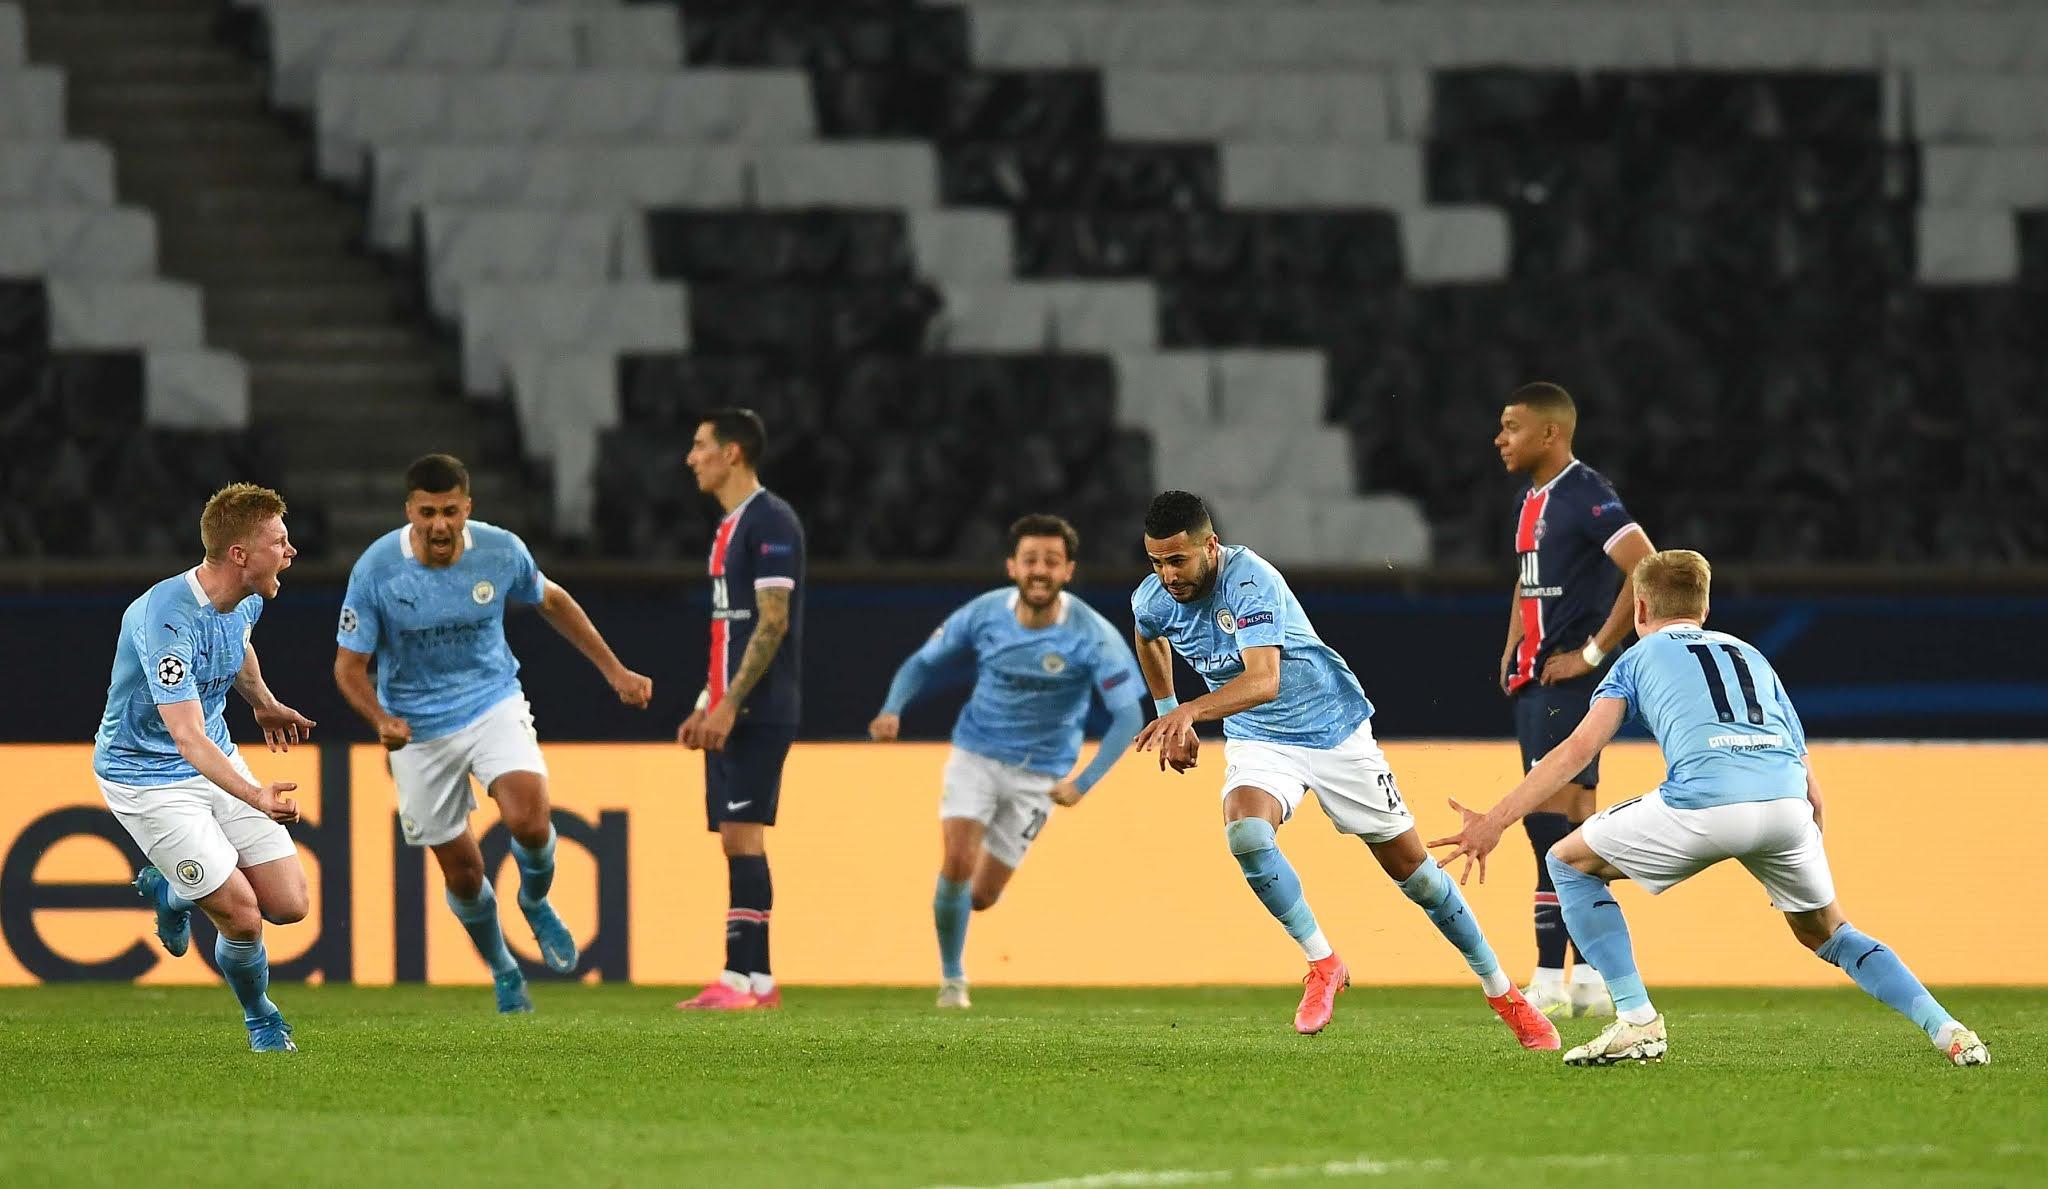 El PSG perdió ante Manchester City en la semifinal de ida de la Champions